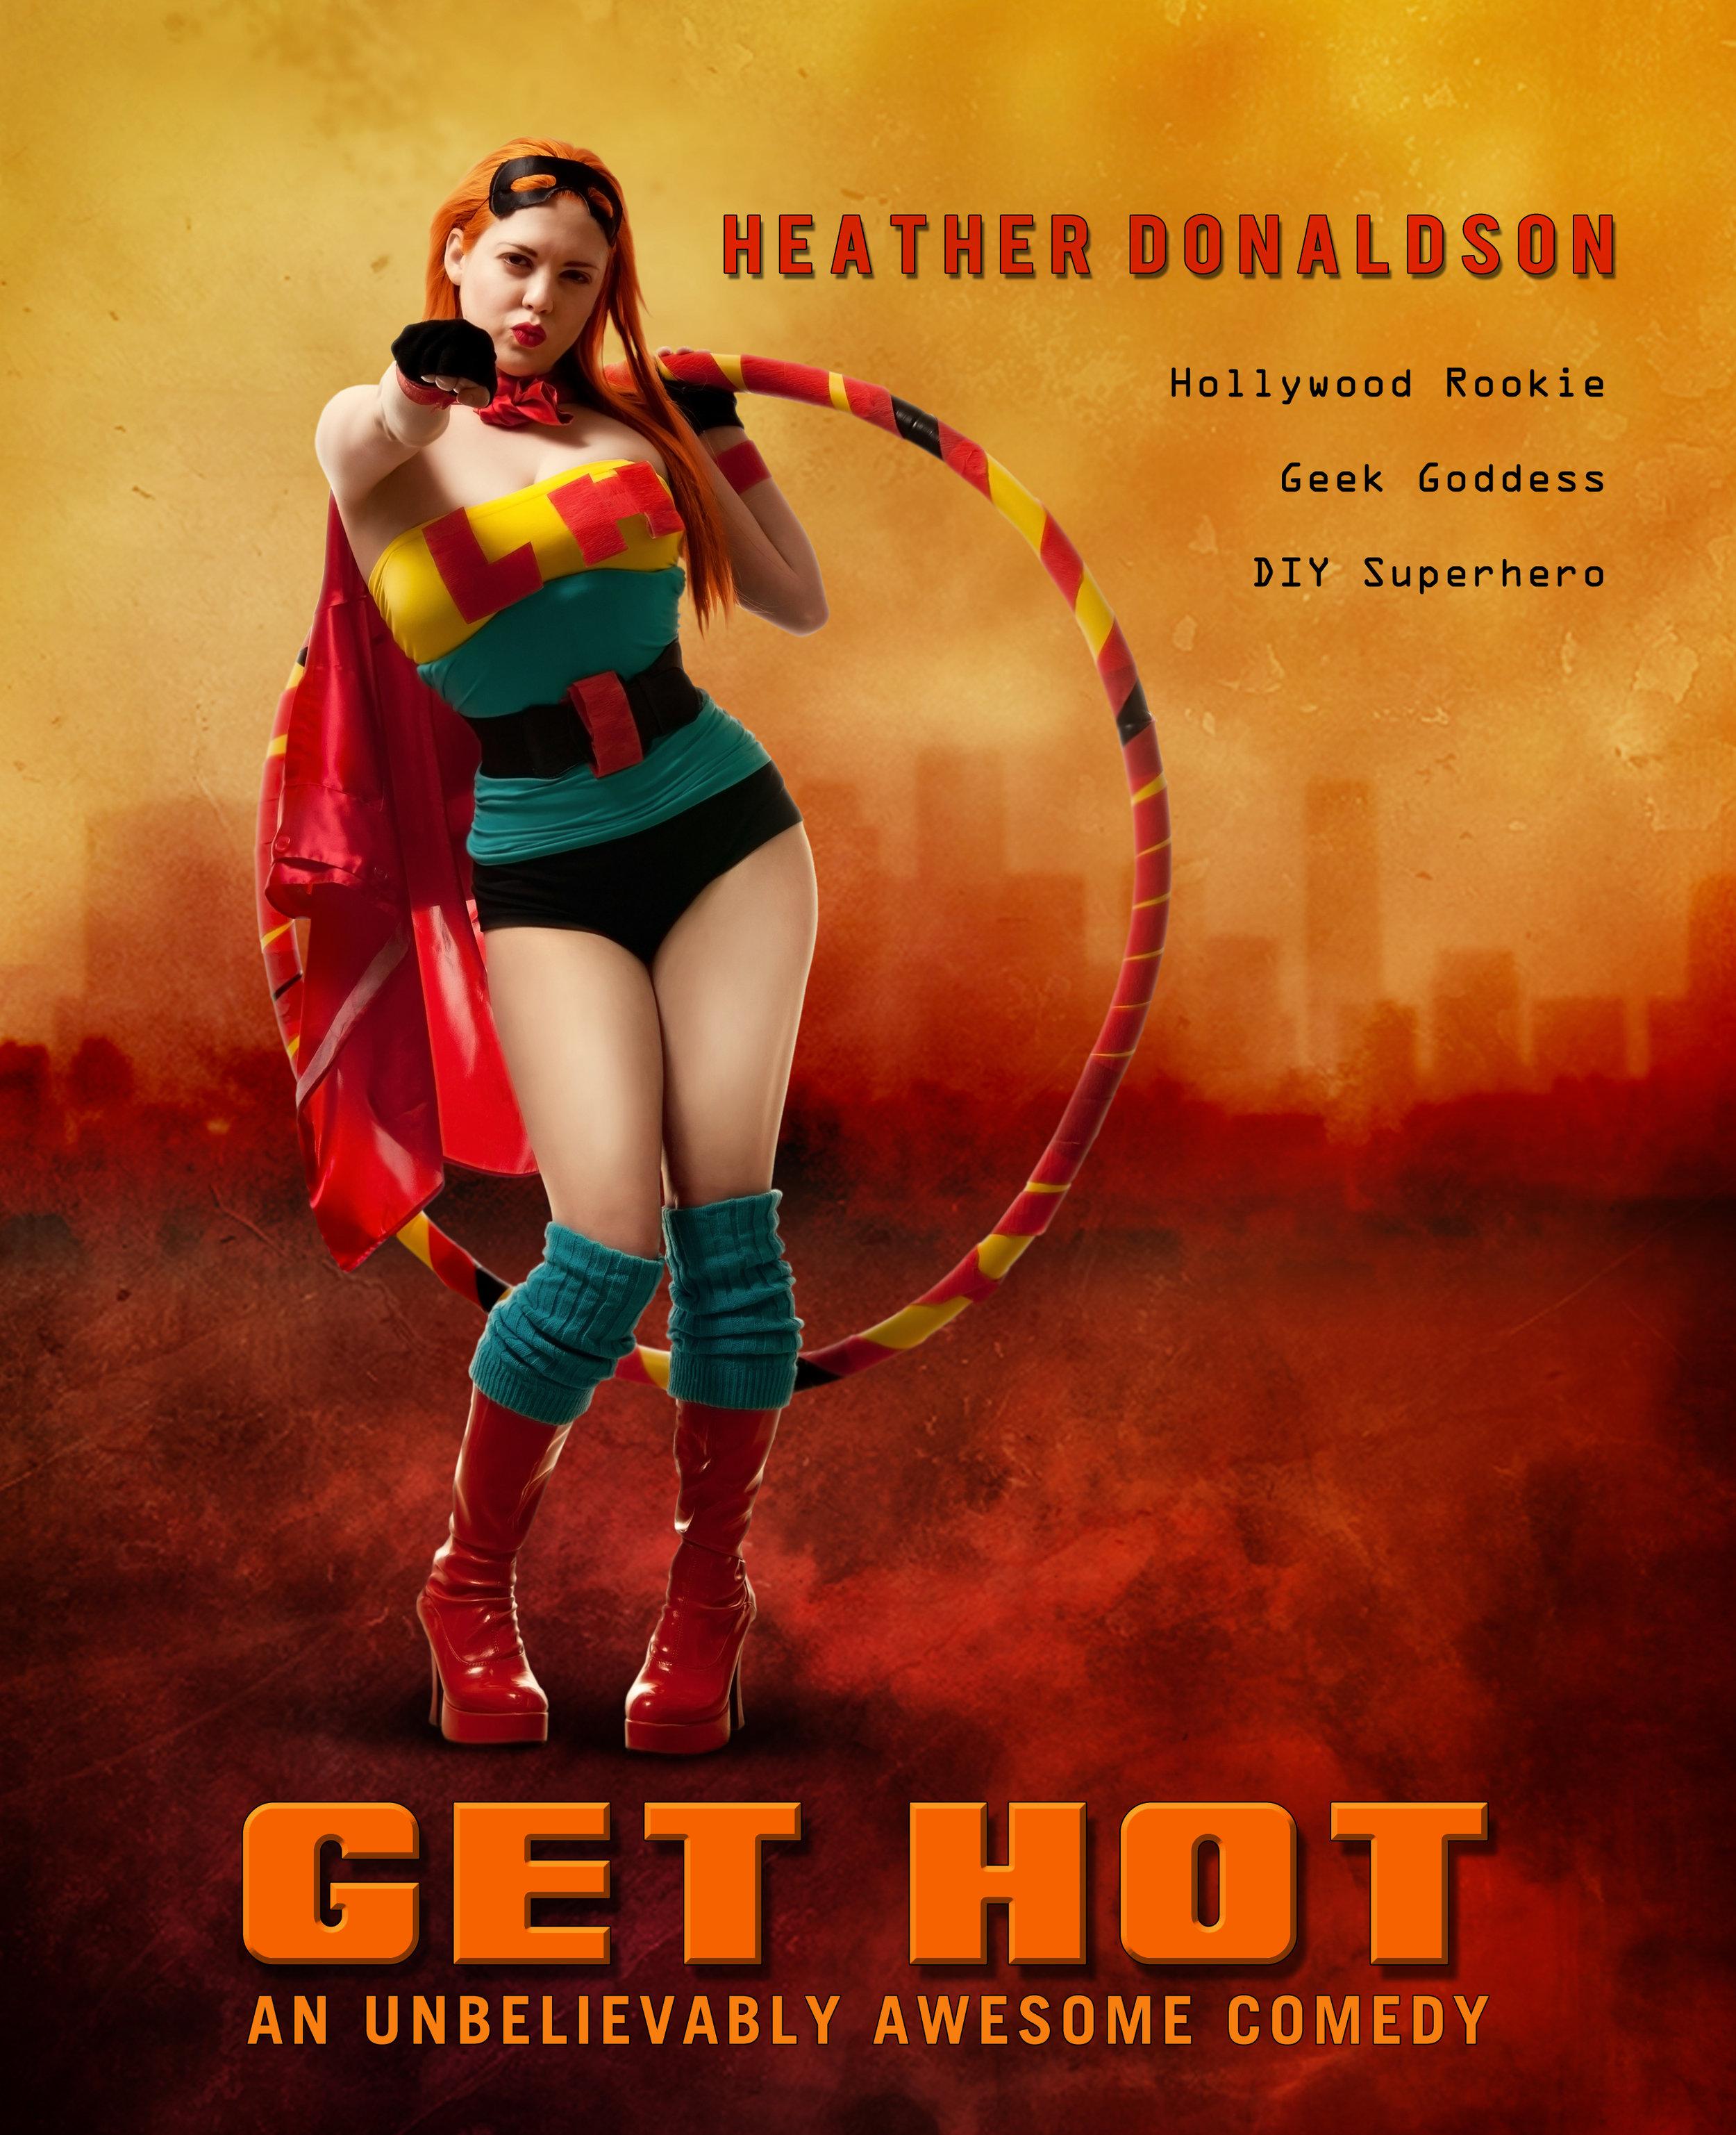 Heather Donaldson: DIY Superhero